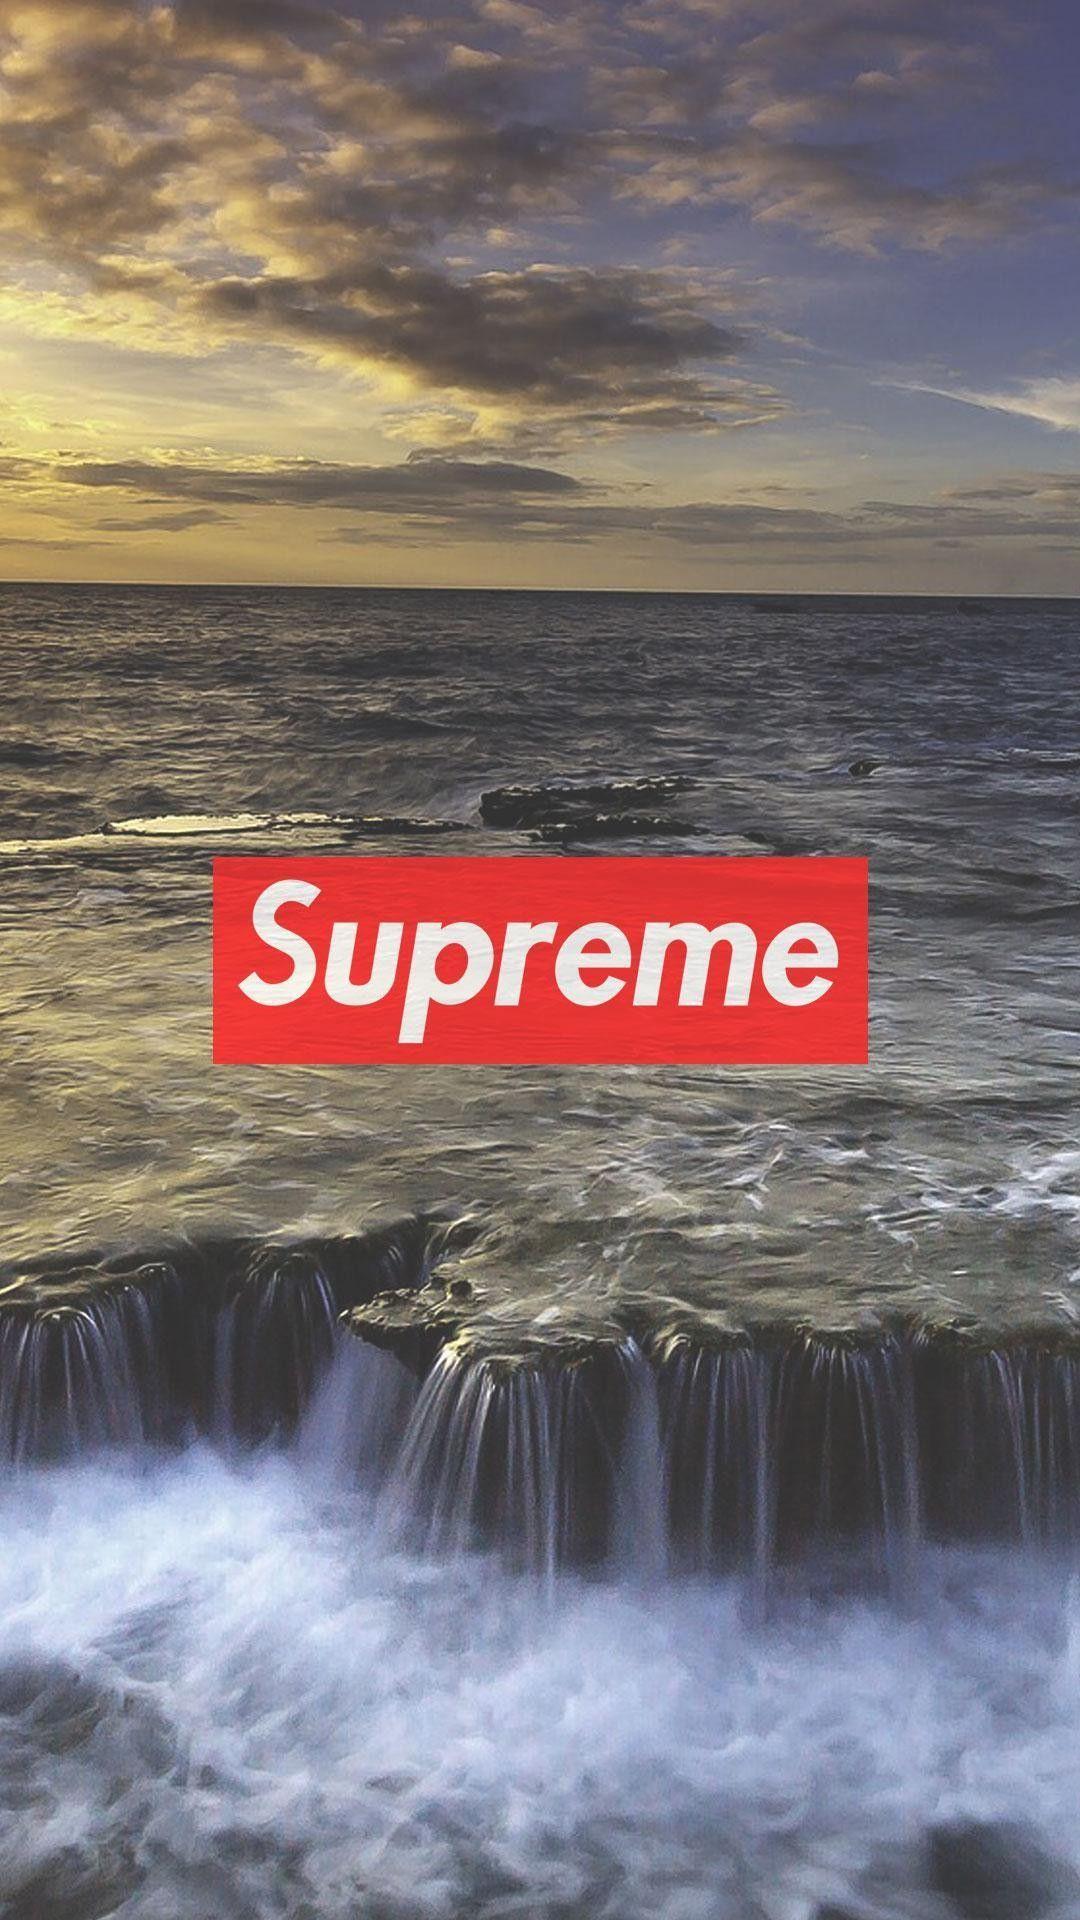 Hypebeast Wallpaper Supreme   Iphone Wallpaper Supreme 1080x1920